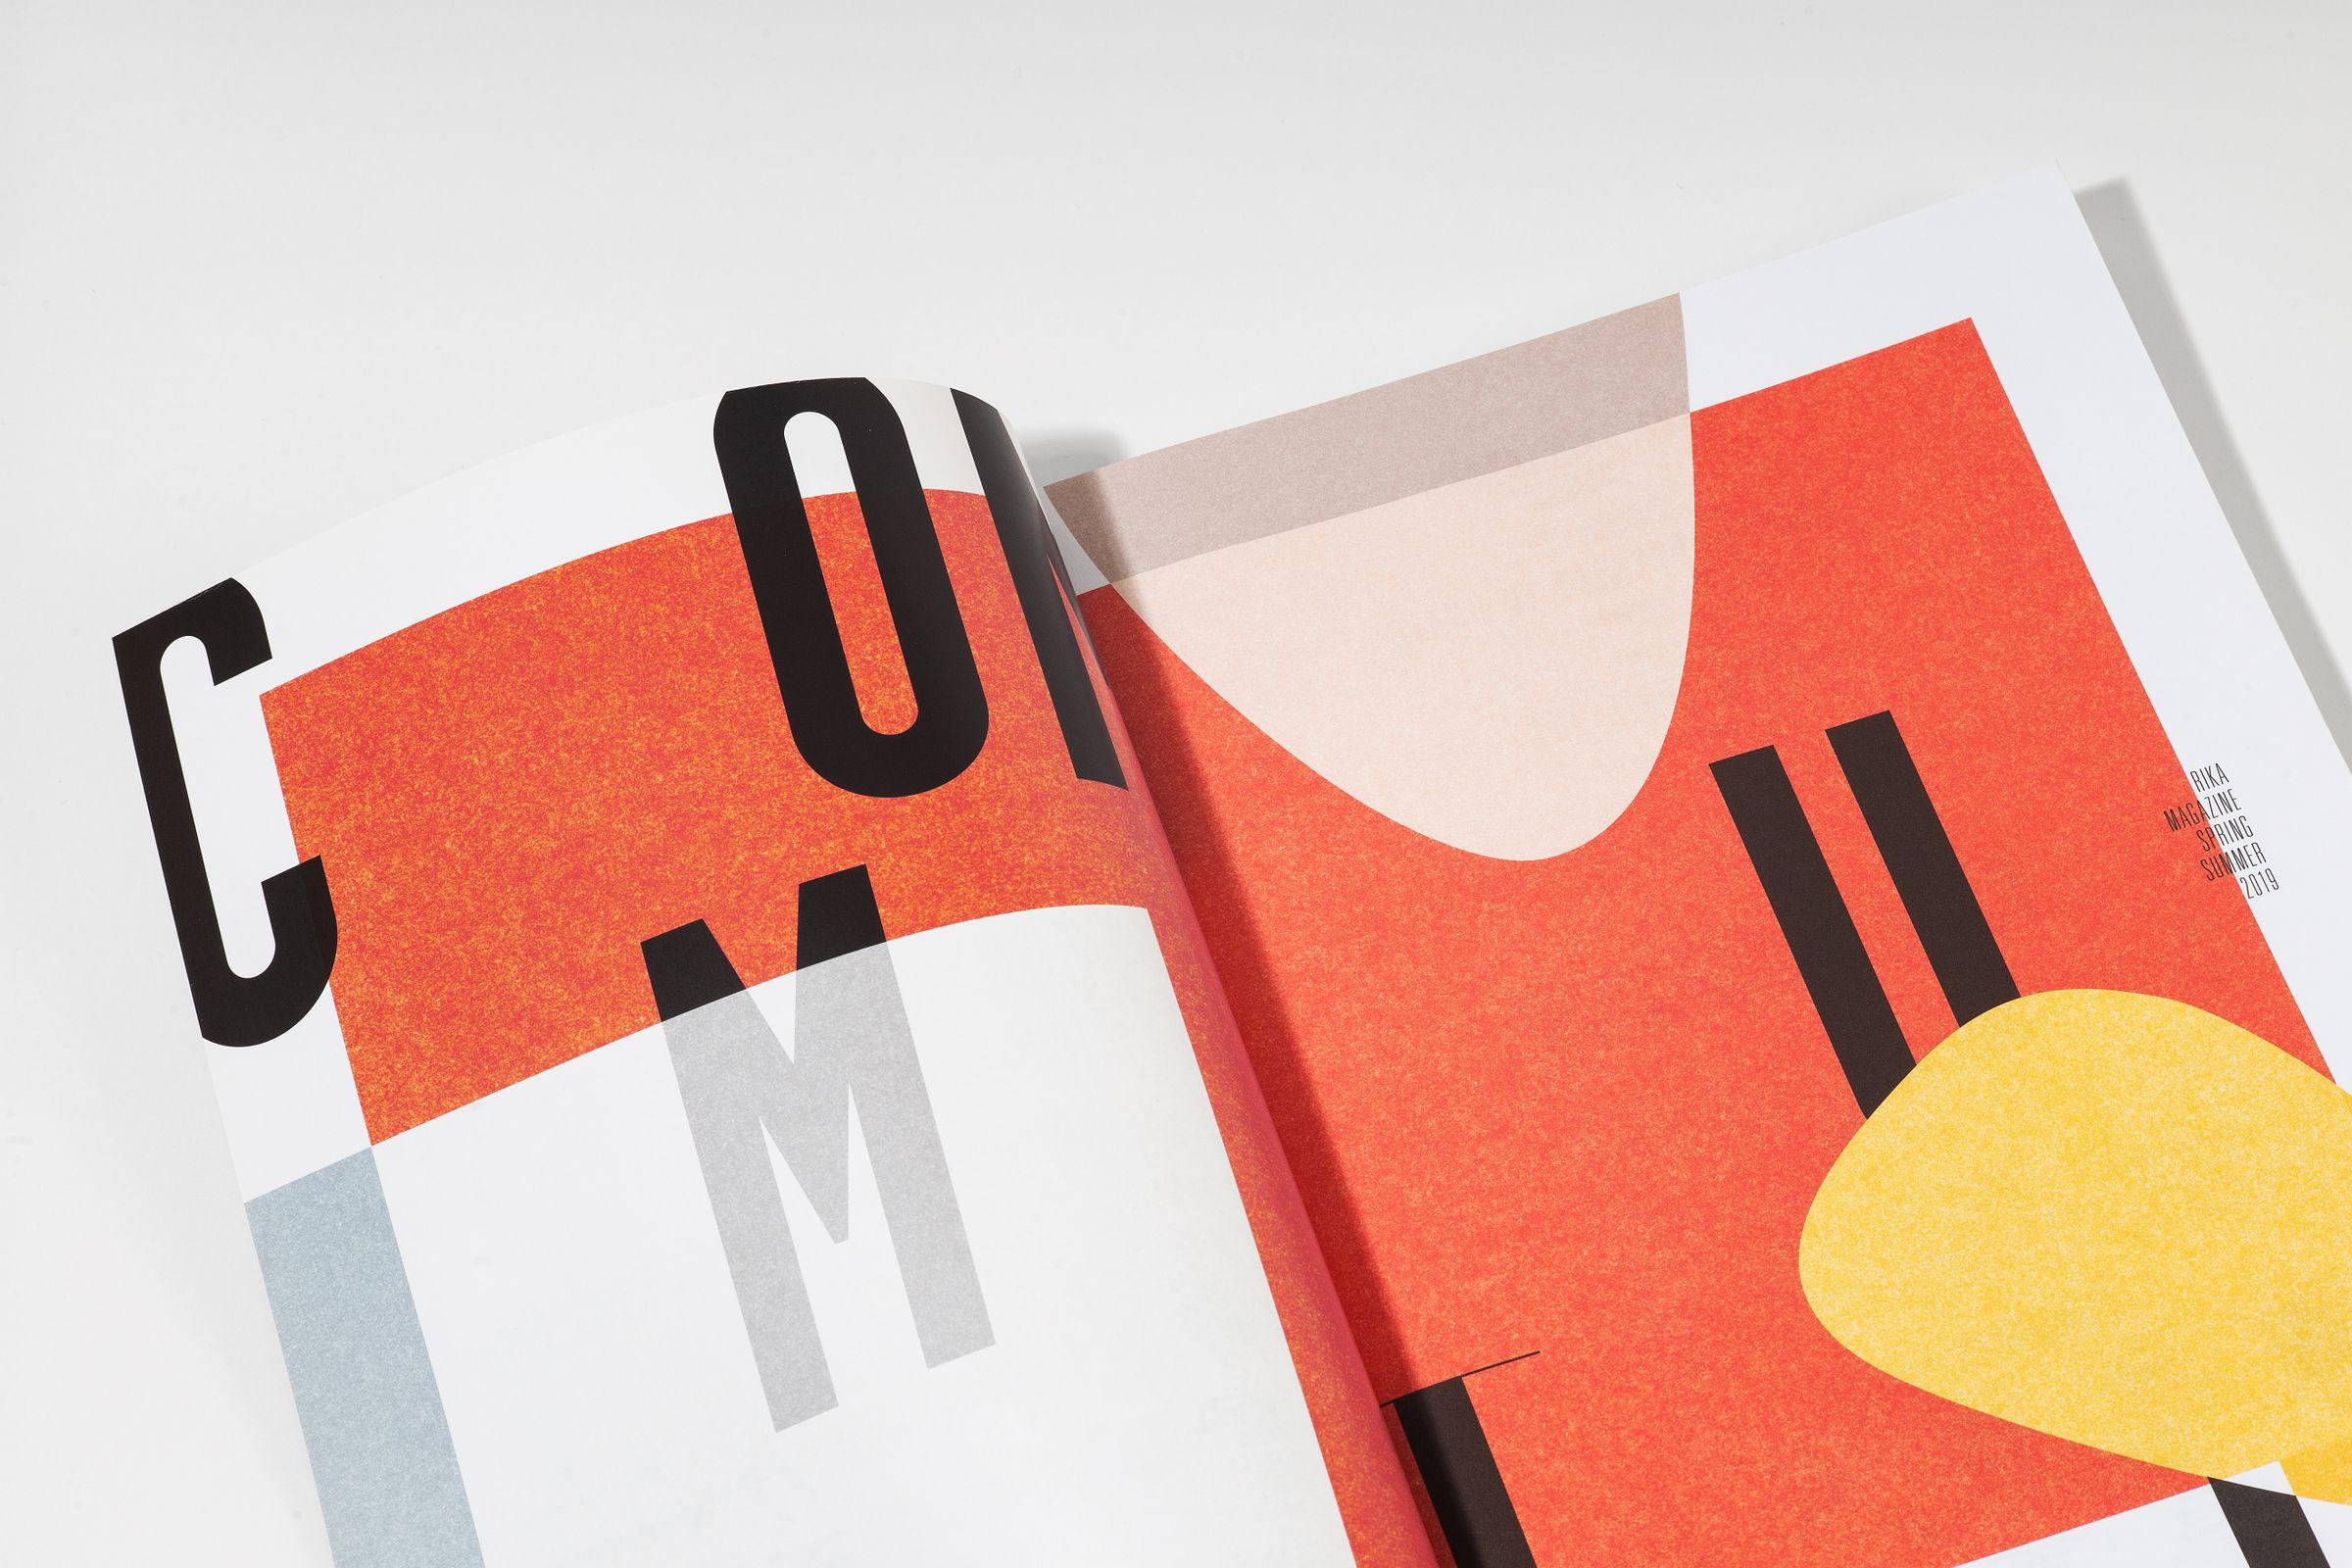 Rika Magazine issue no. 19 custom typography layout